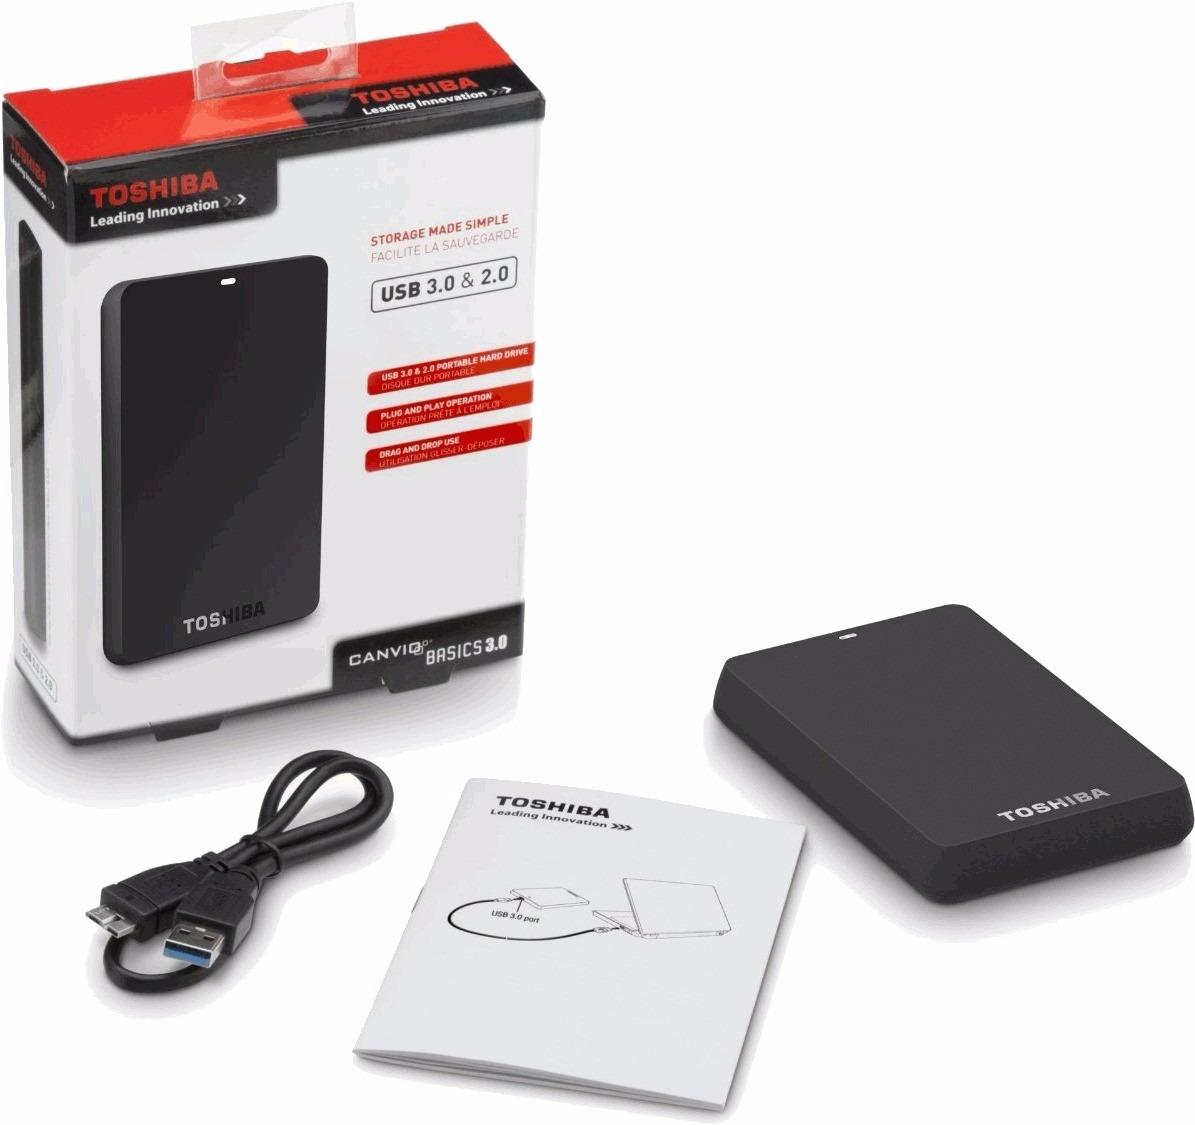 disco duro 1 tera externo toshiba 1000gb usb dd en mercado libre. Black Bedroom Furniture Sets. Home Design Ideas